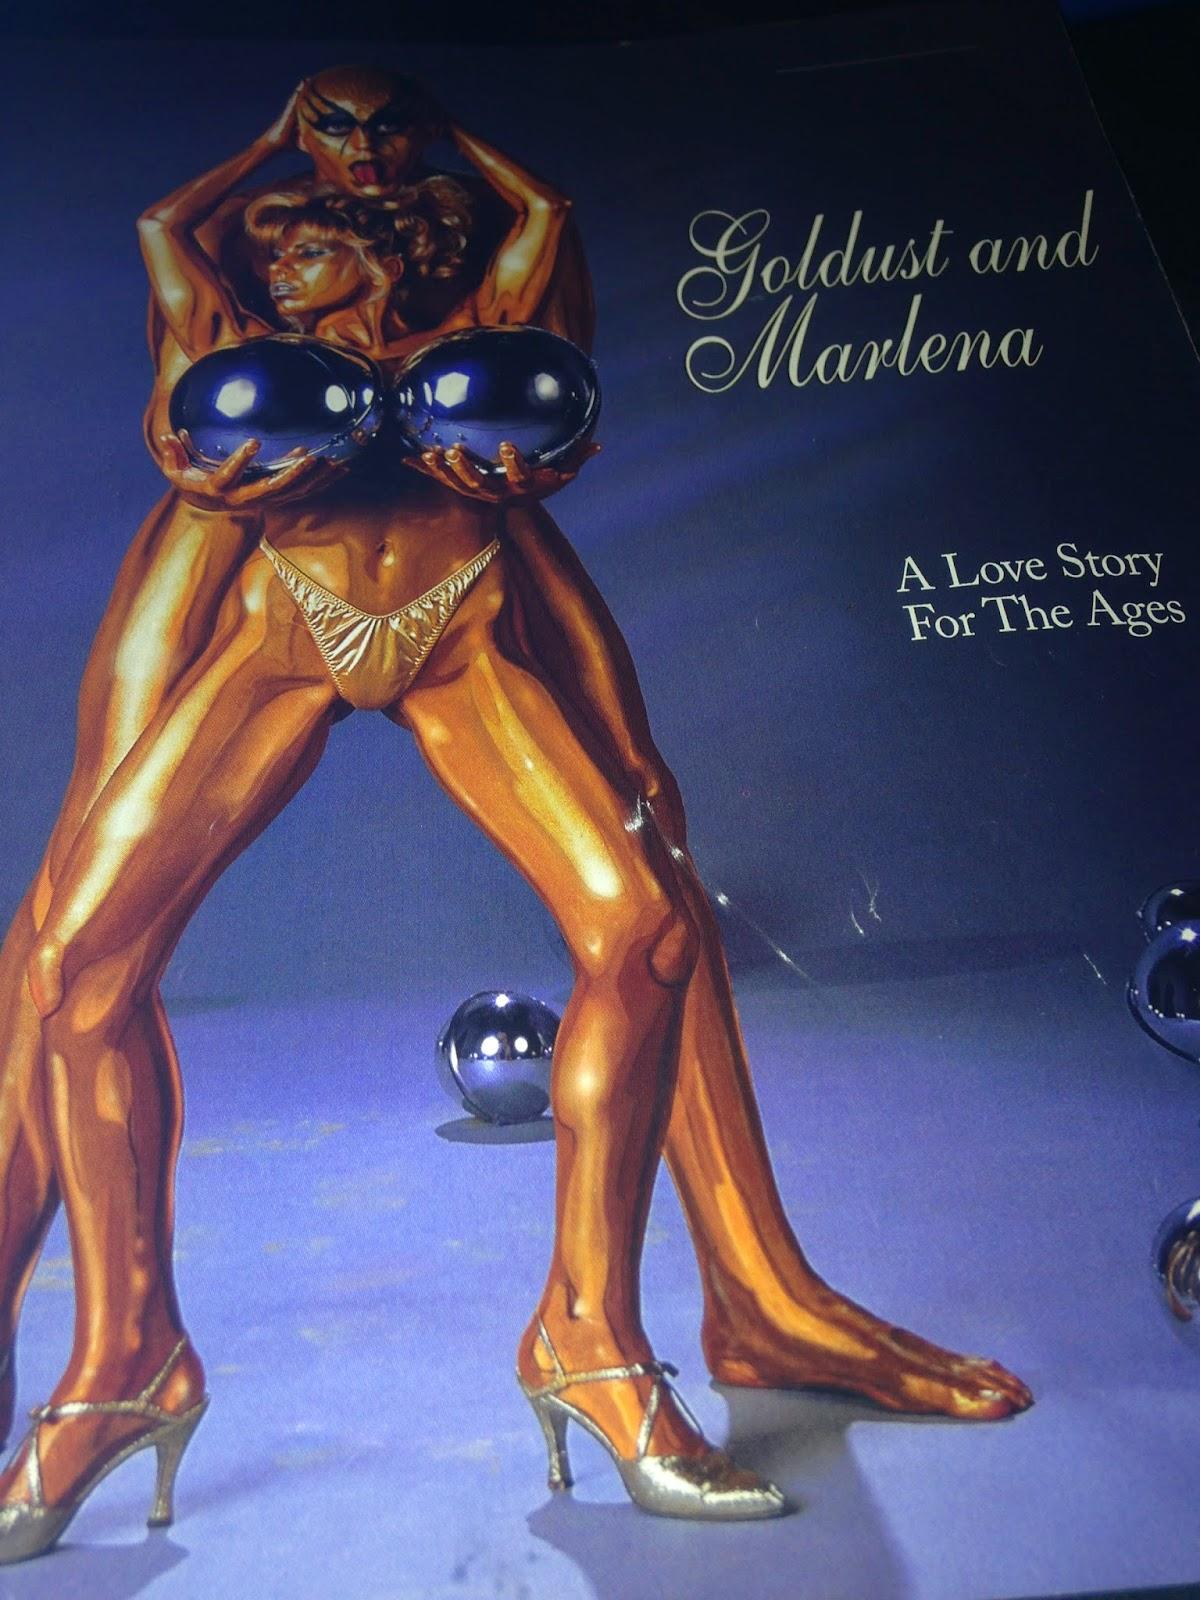 WWE - WWF RAW MAGAZINE 1997: Goldust and Marlena